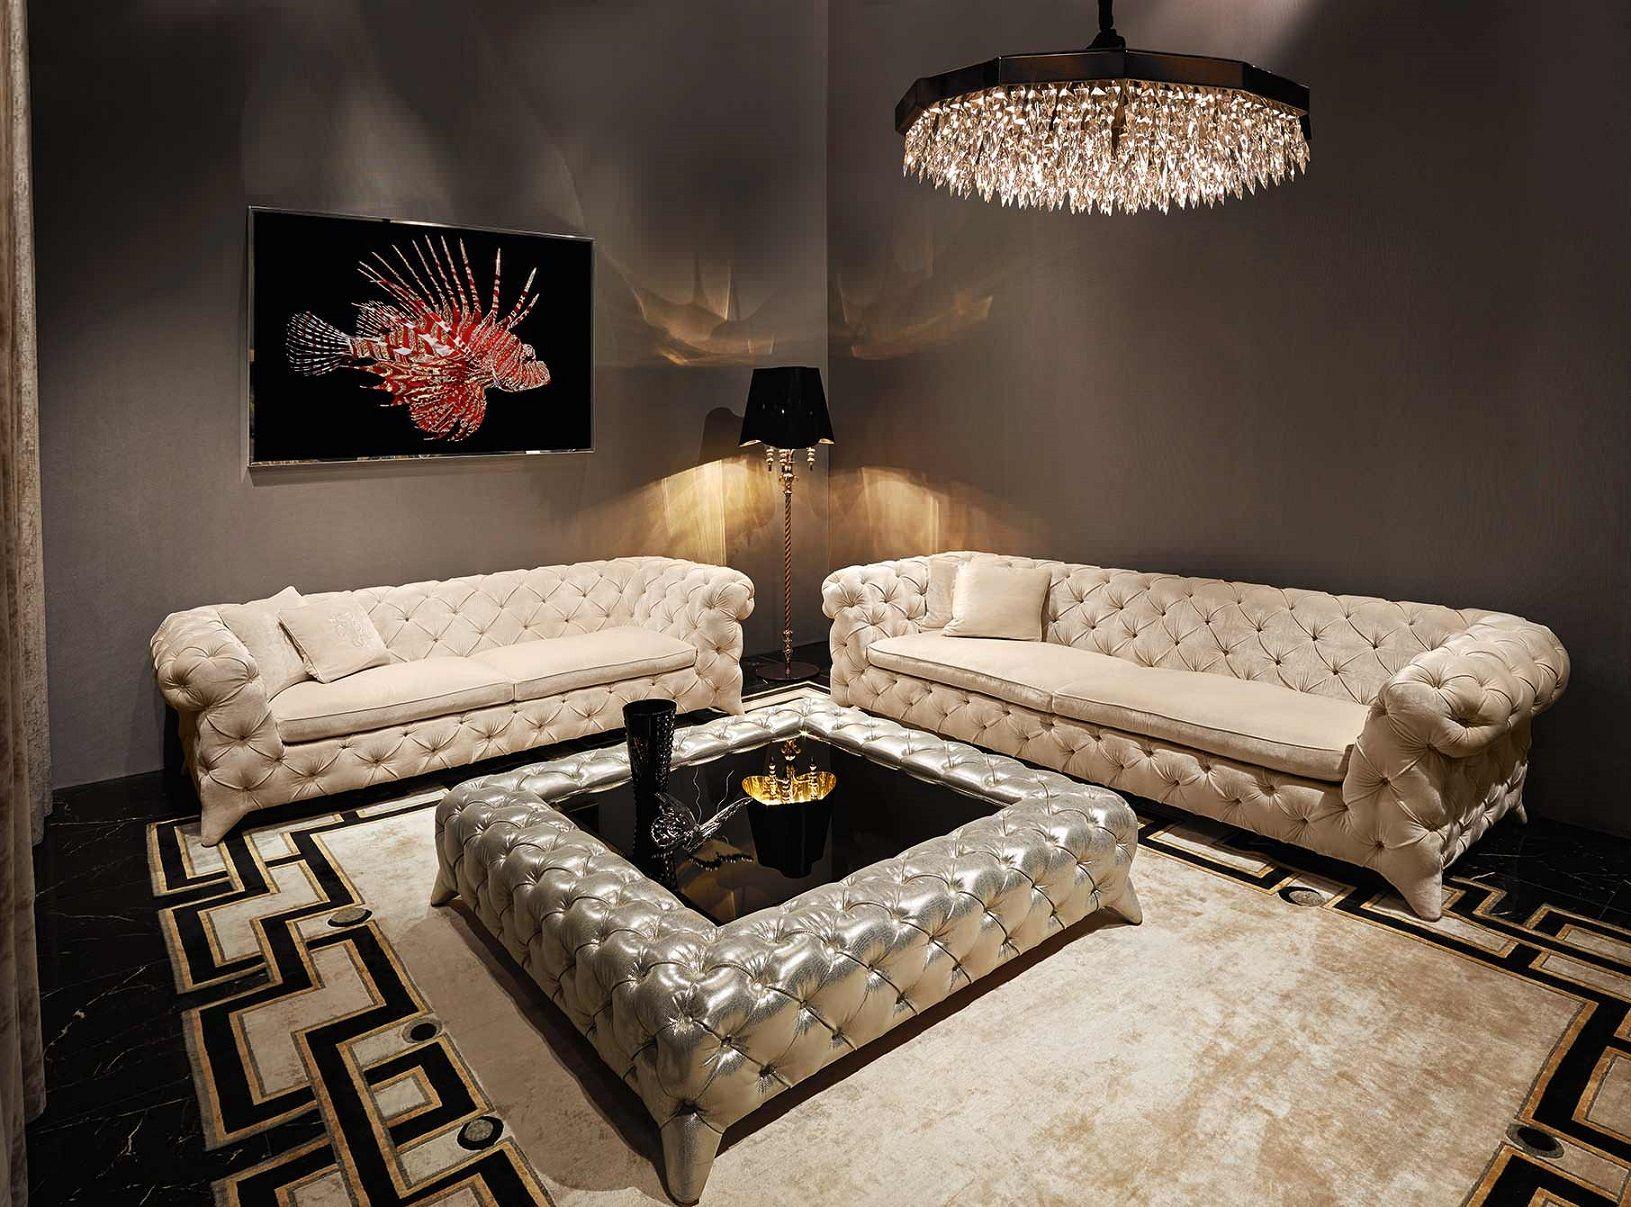 Luxury Sectional Sofas Bocadolobo Luxuryfurniture Interiodesign Designideas So Luxury Living Room Luxury Living Room Inspiration Luxury Sofa Living Room